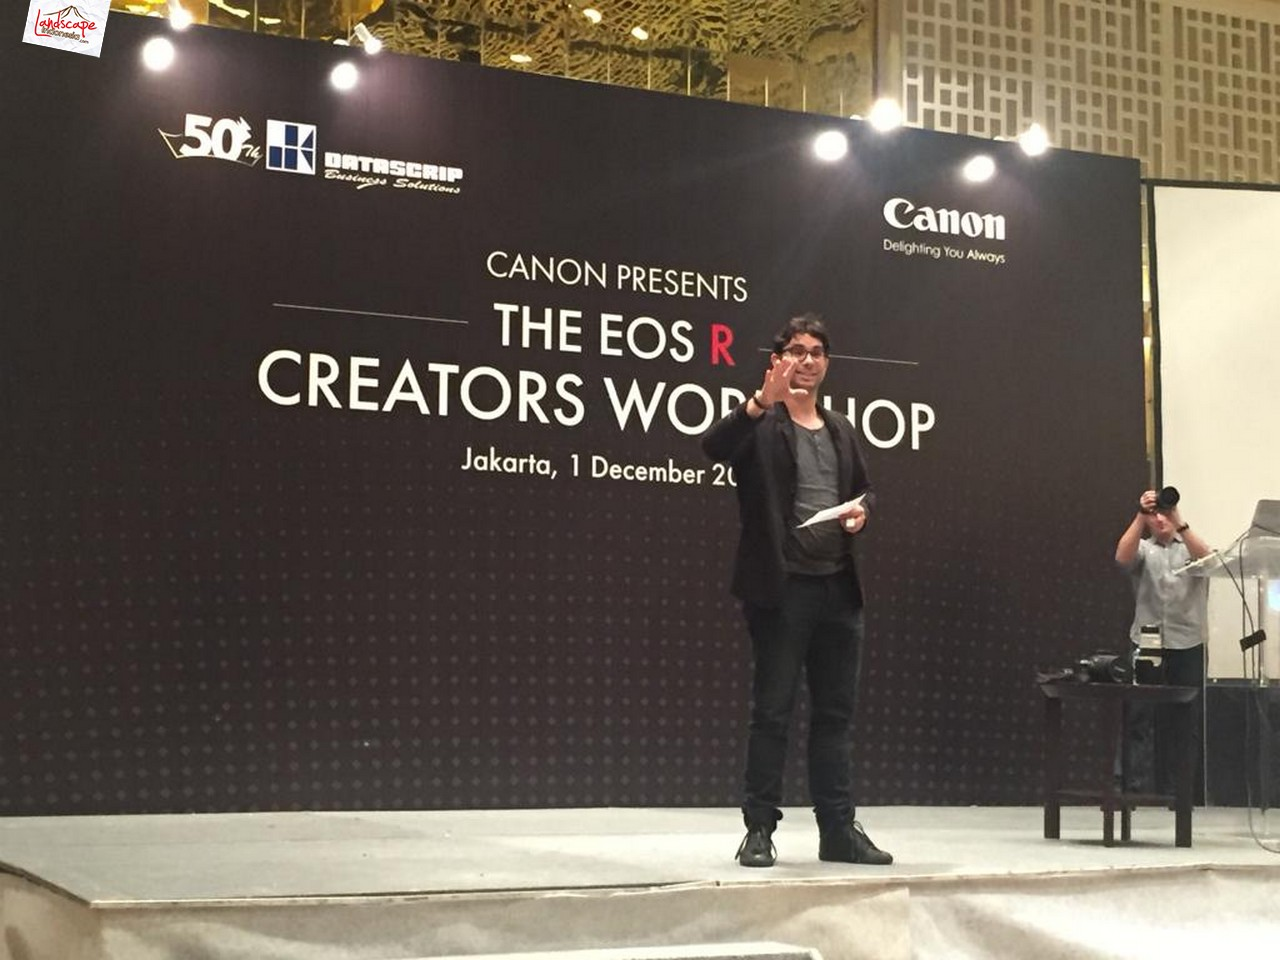 eos r creators workshop 8 - EOS R Creators Workshop